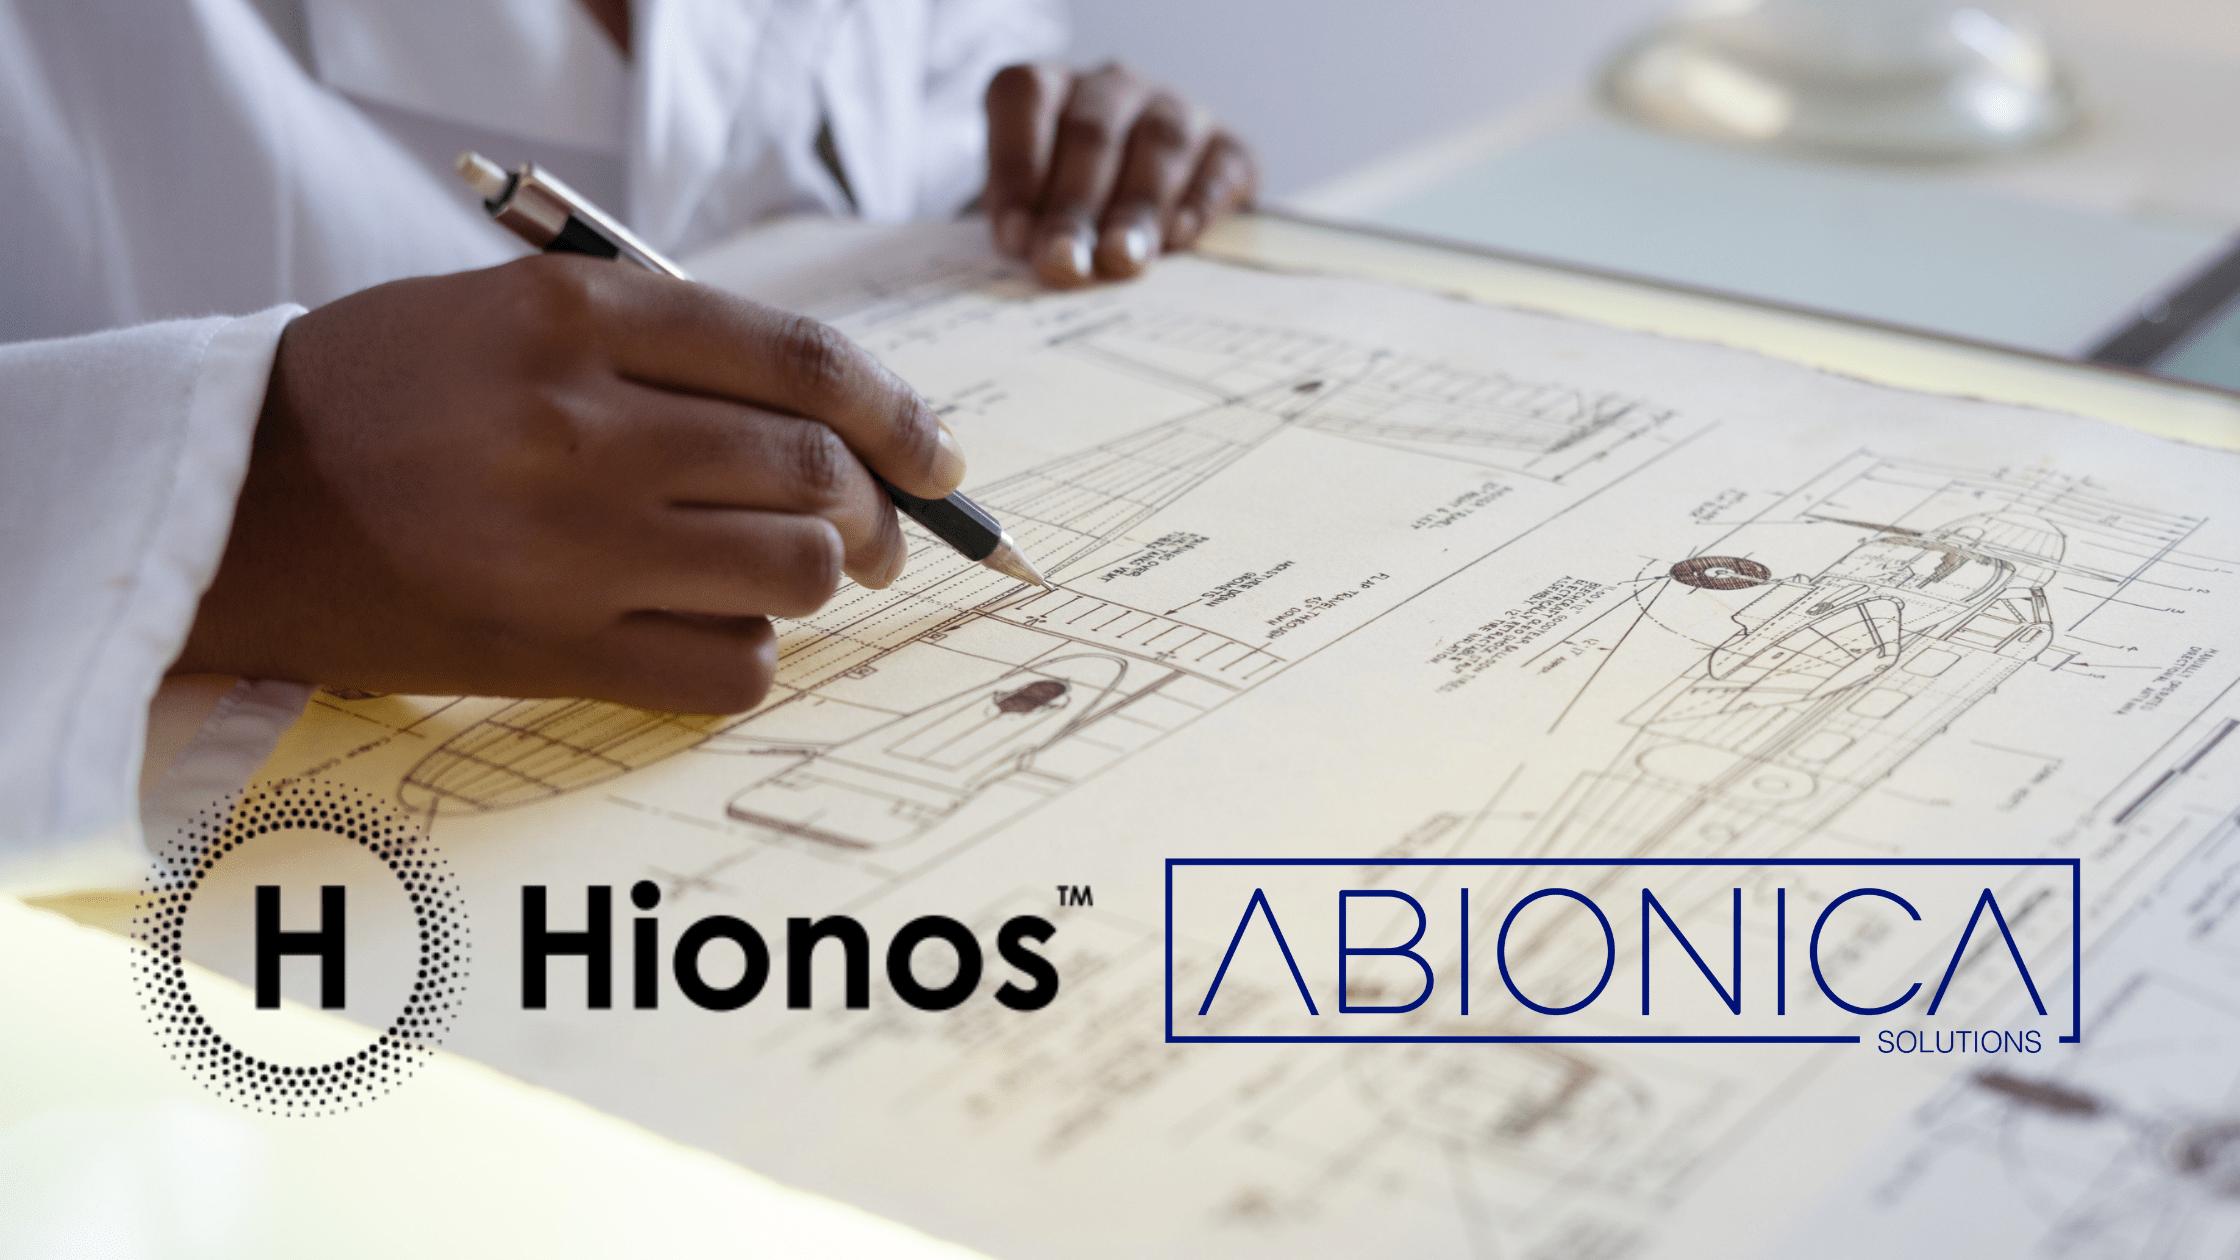 Hionos x Abionica